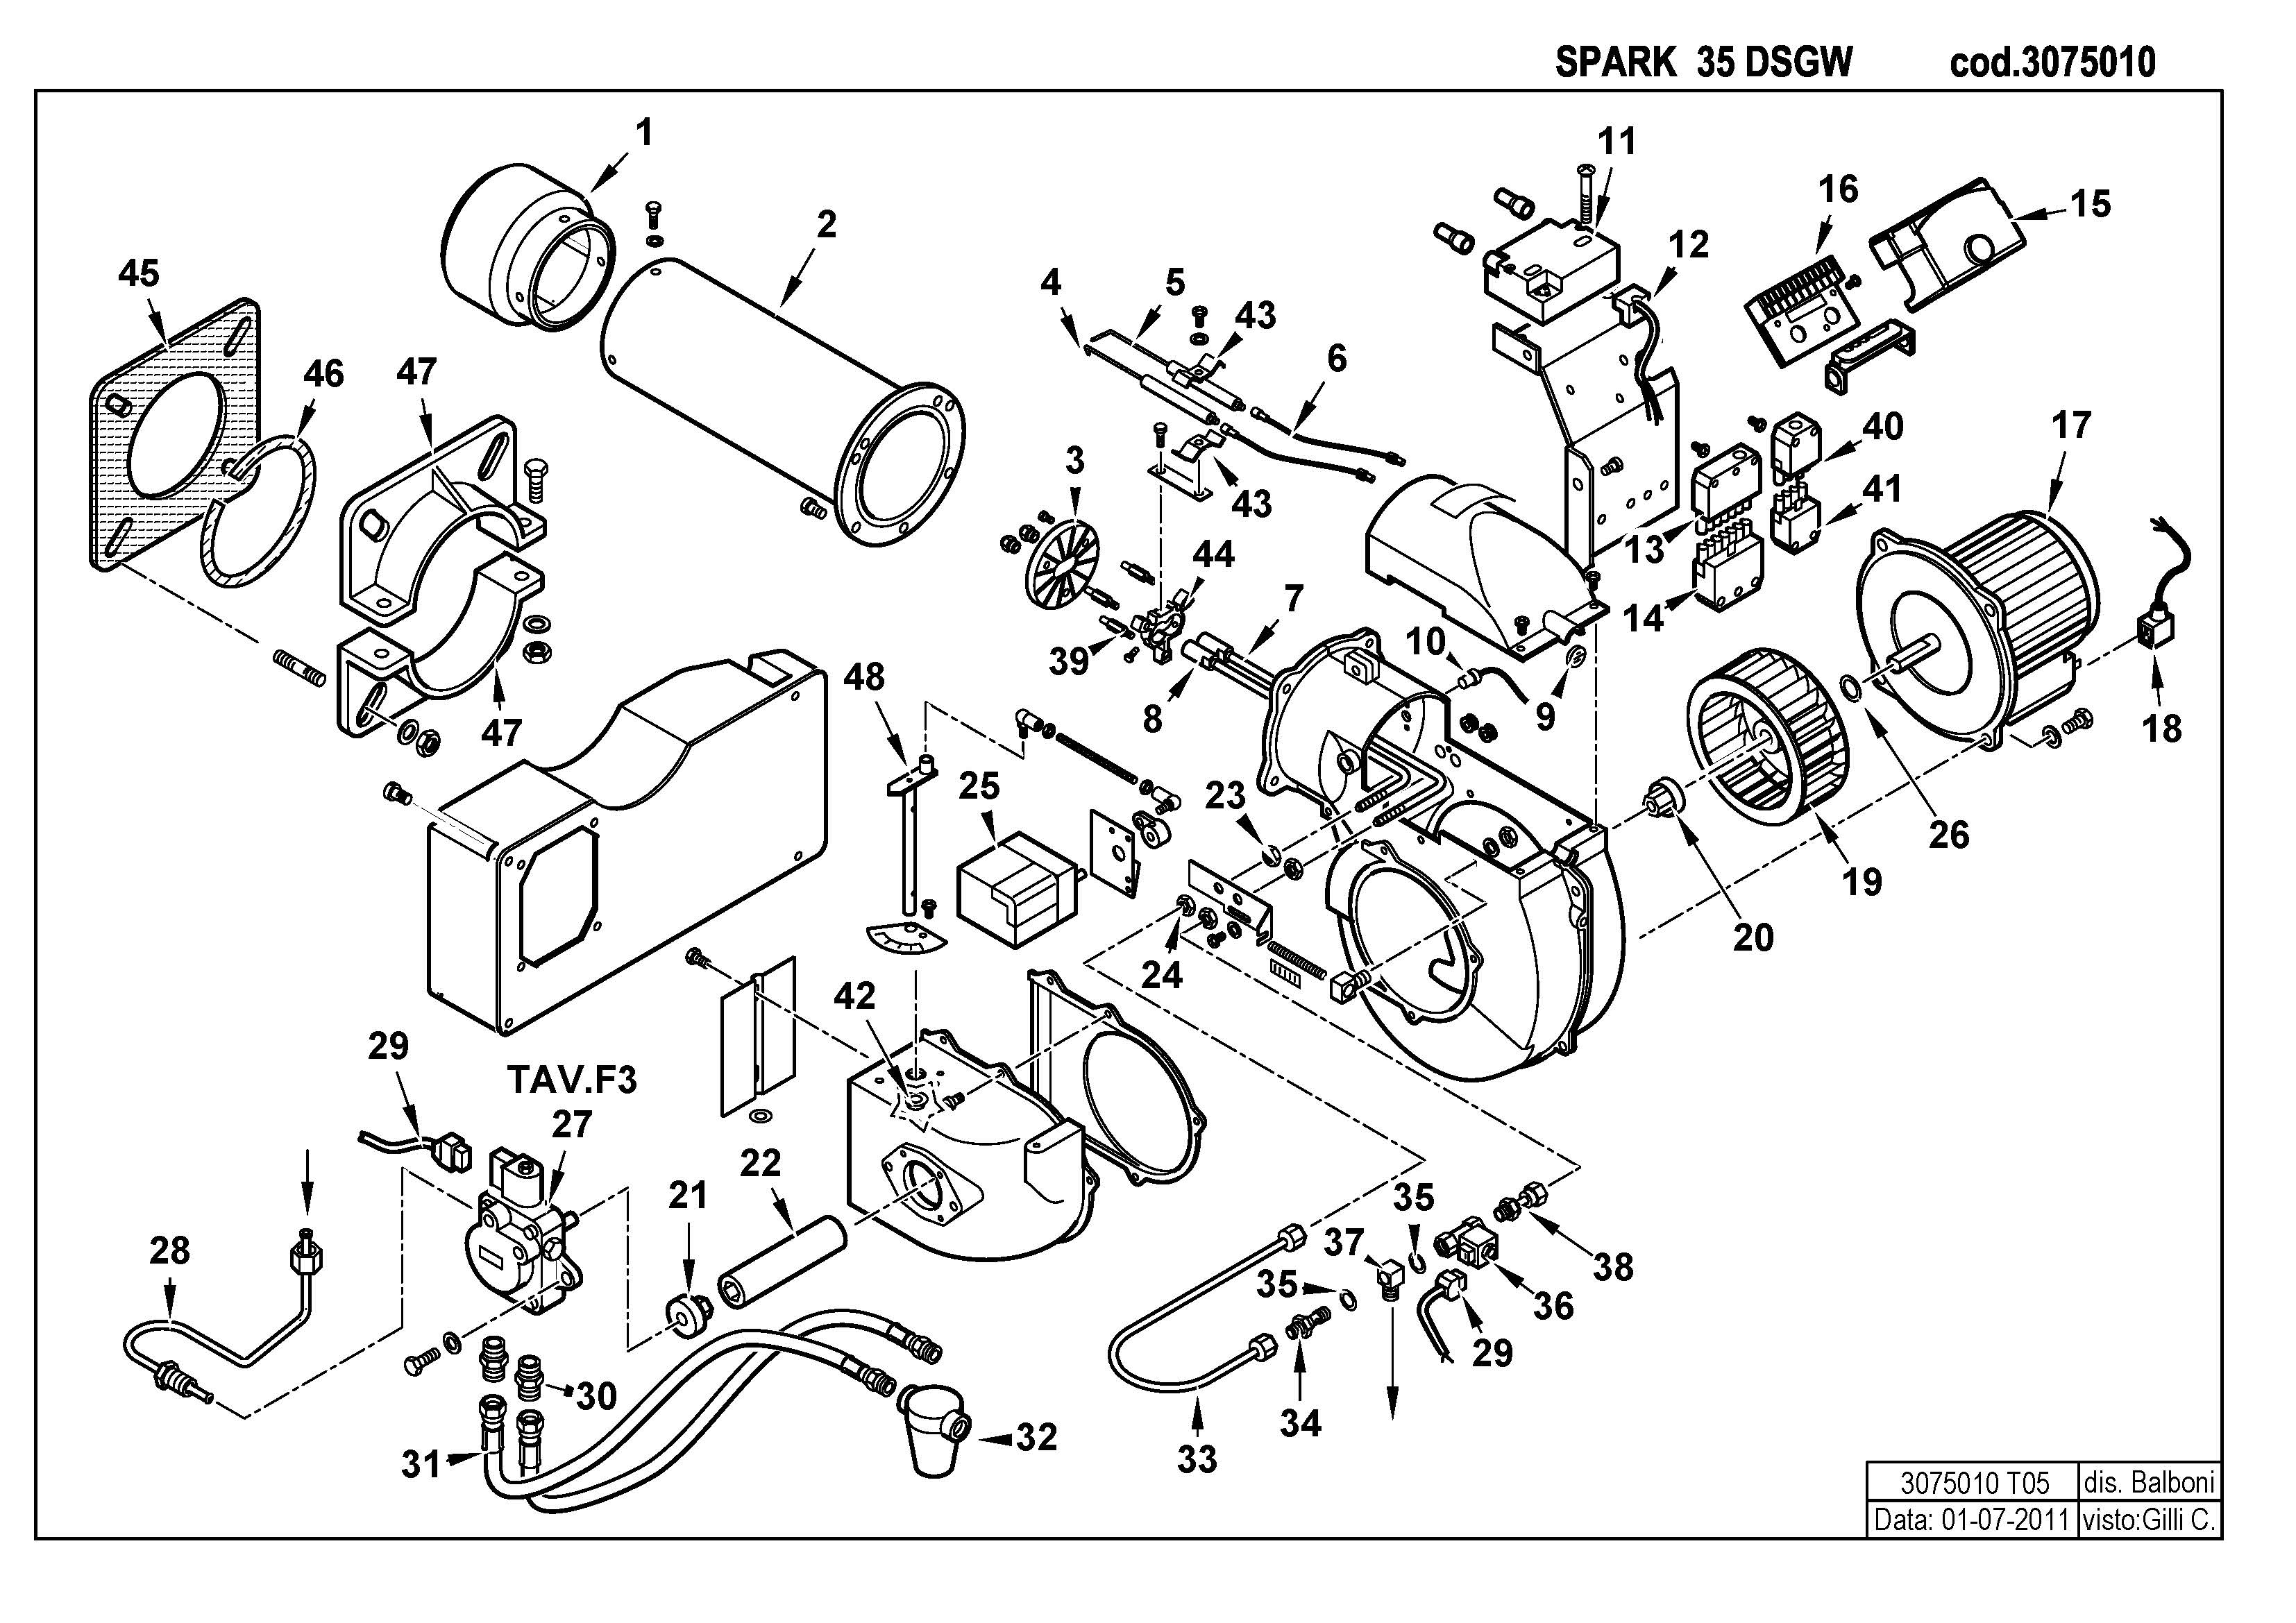 SPARK 35 DSGW 3075010 5 20110701